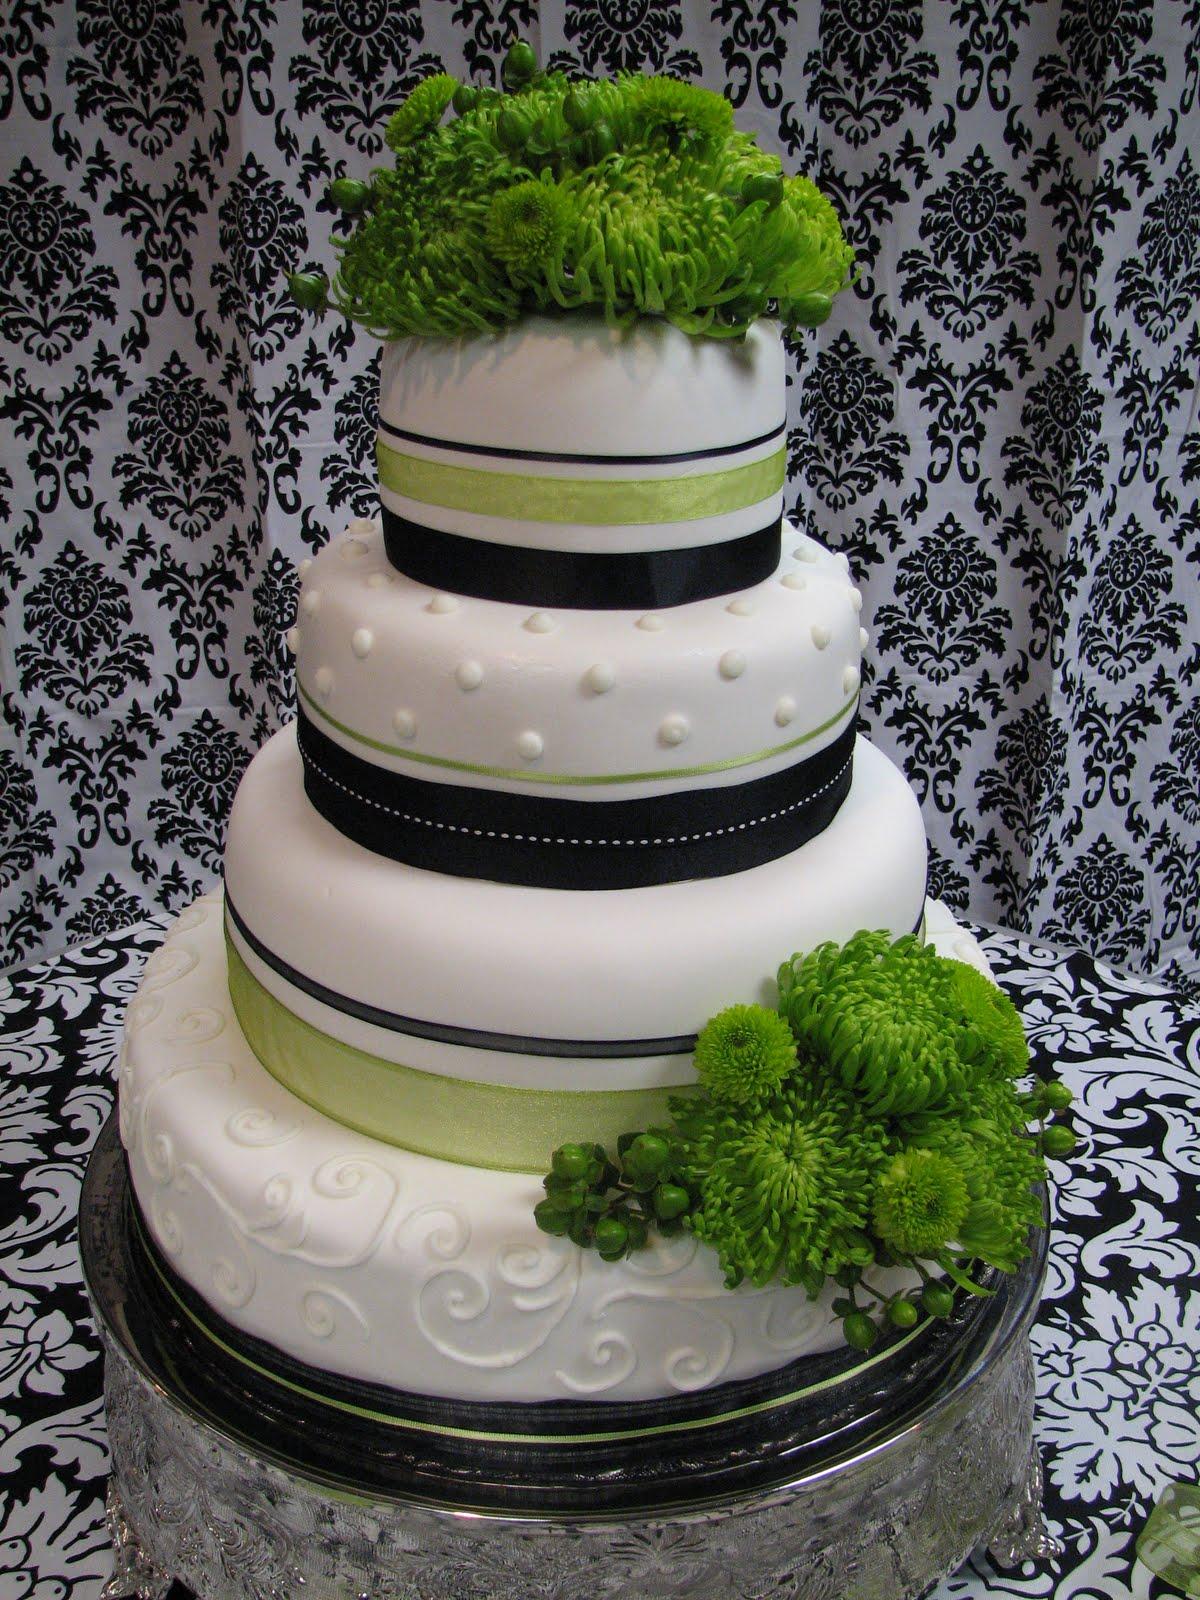 Decadent Designs Black White And Apple Green Wedding Cake